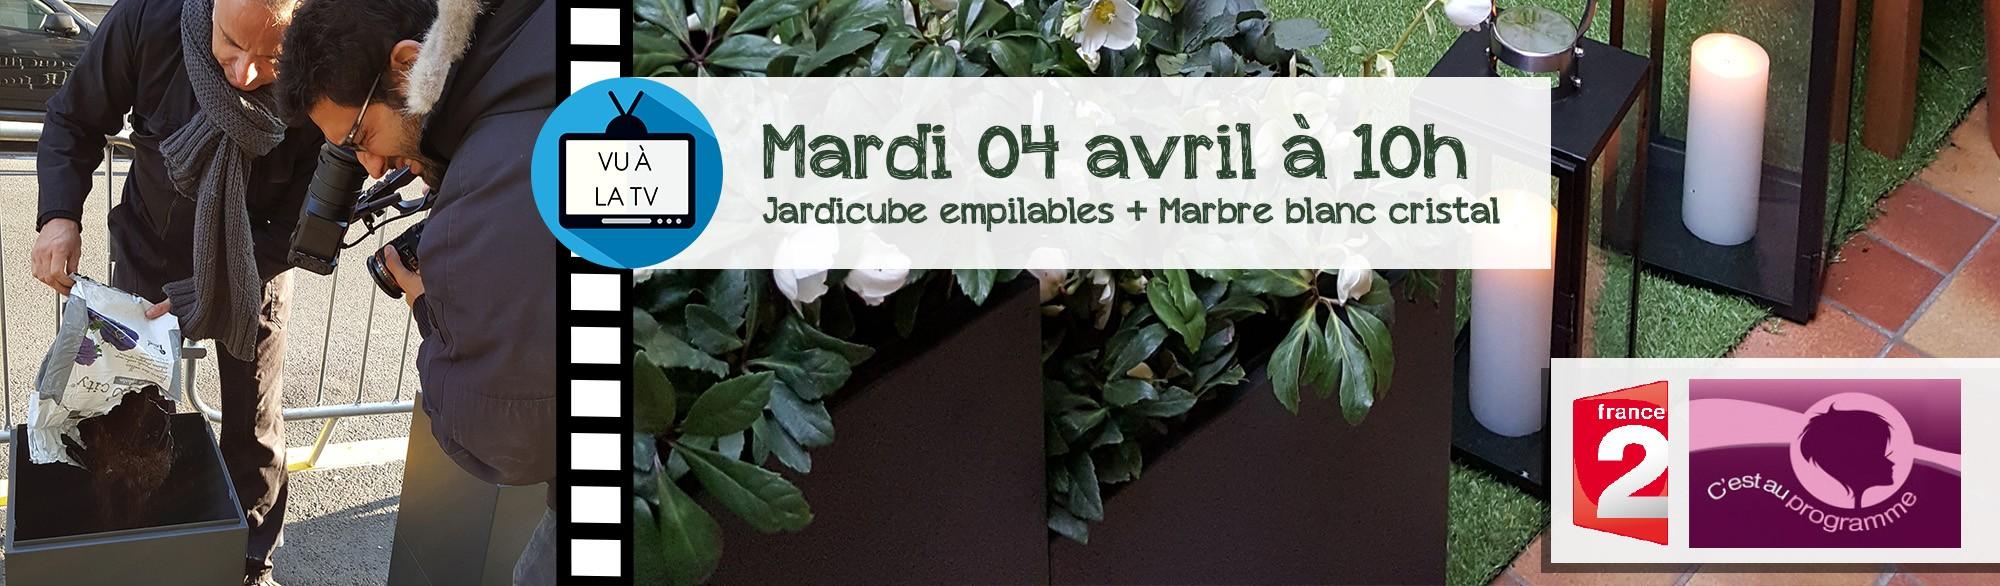 France 2 Jardicube avril 2017